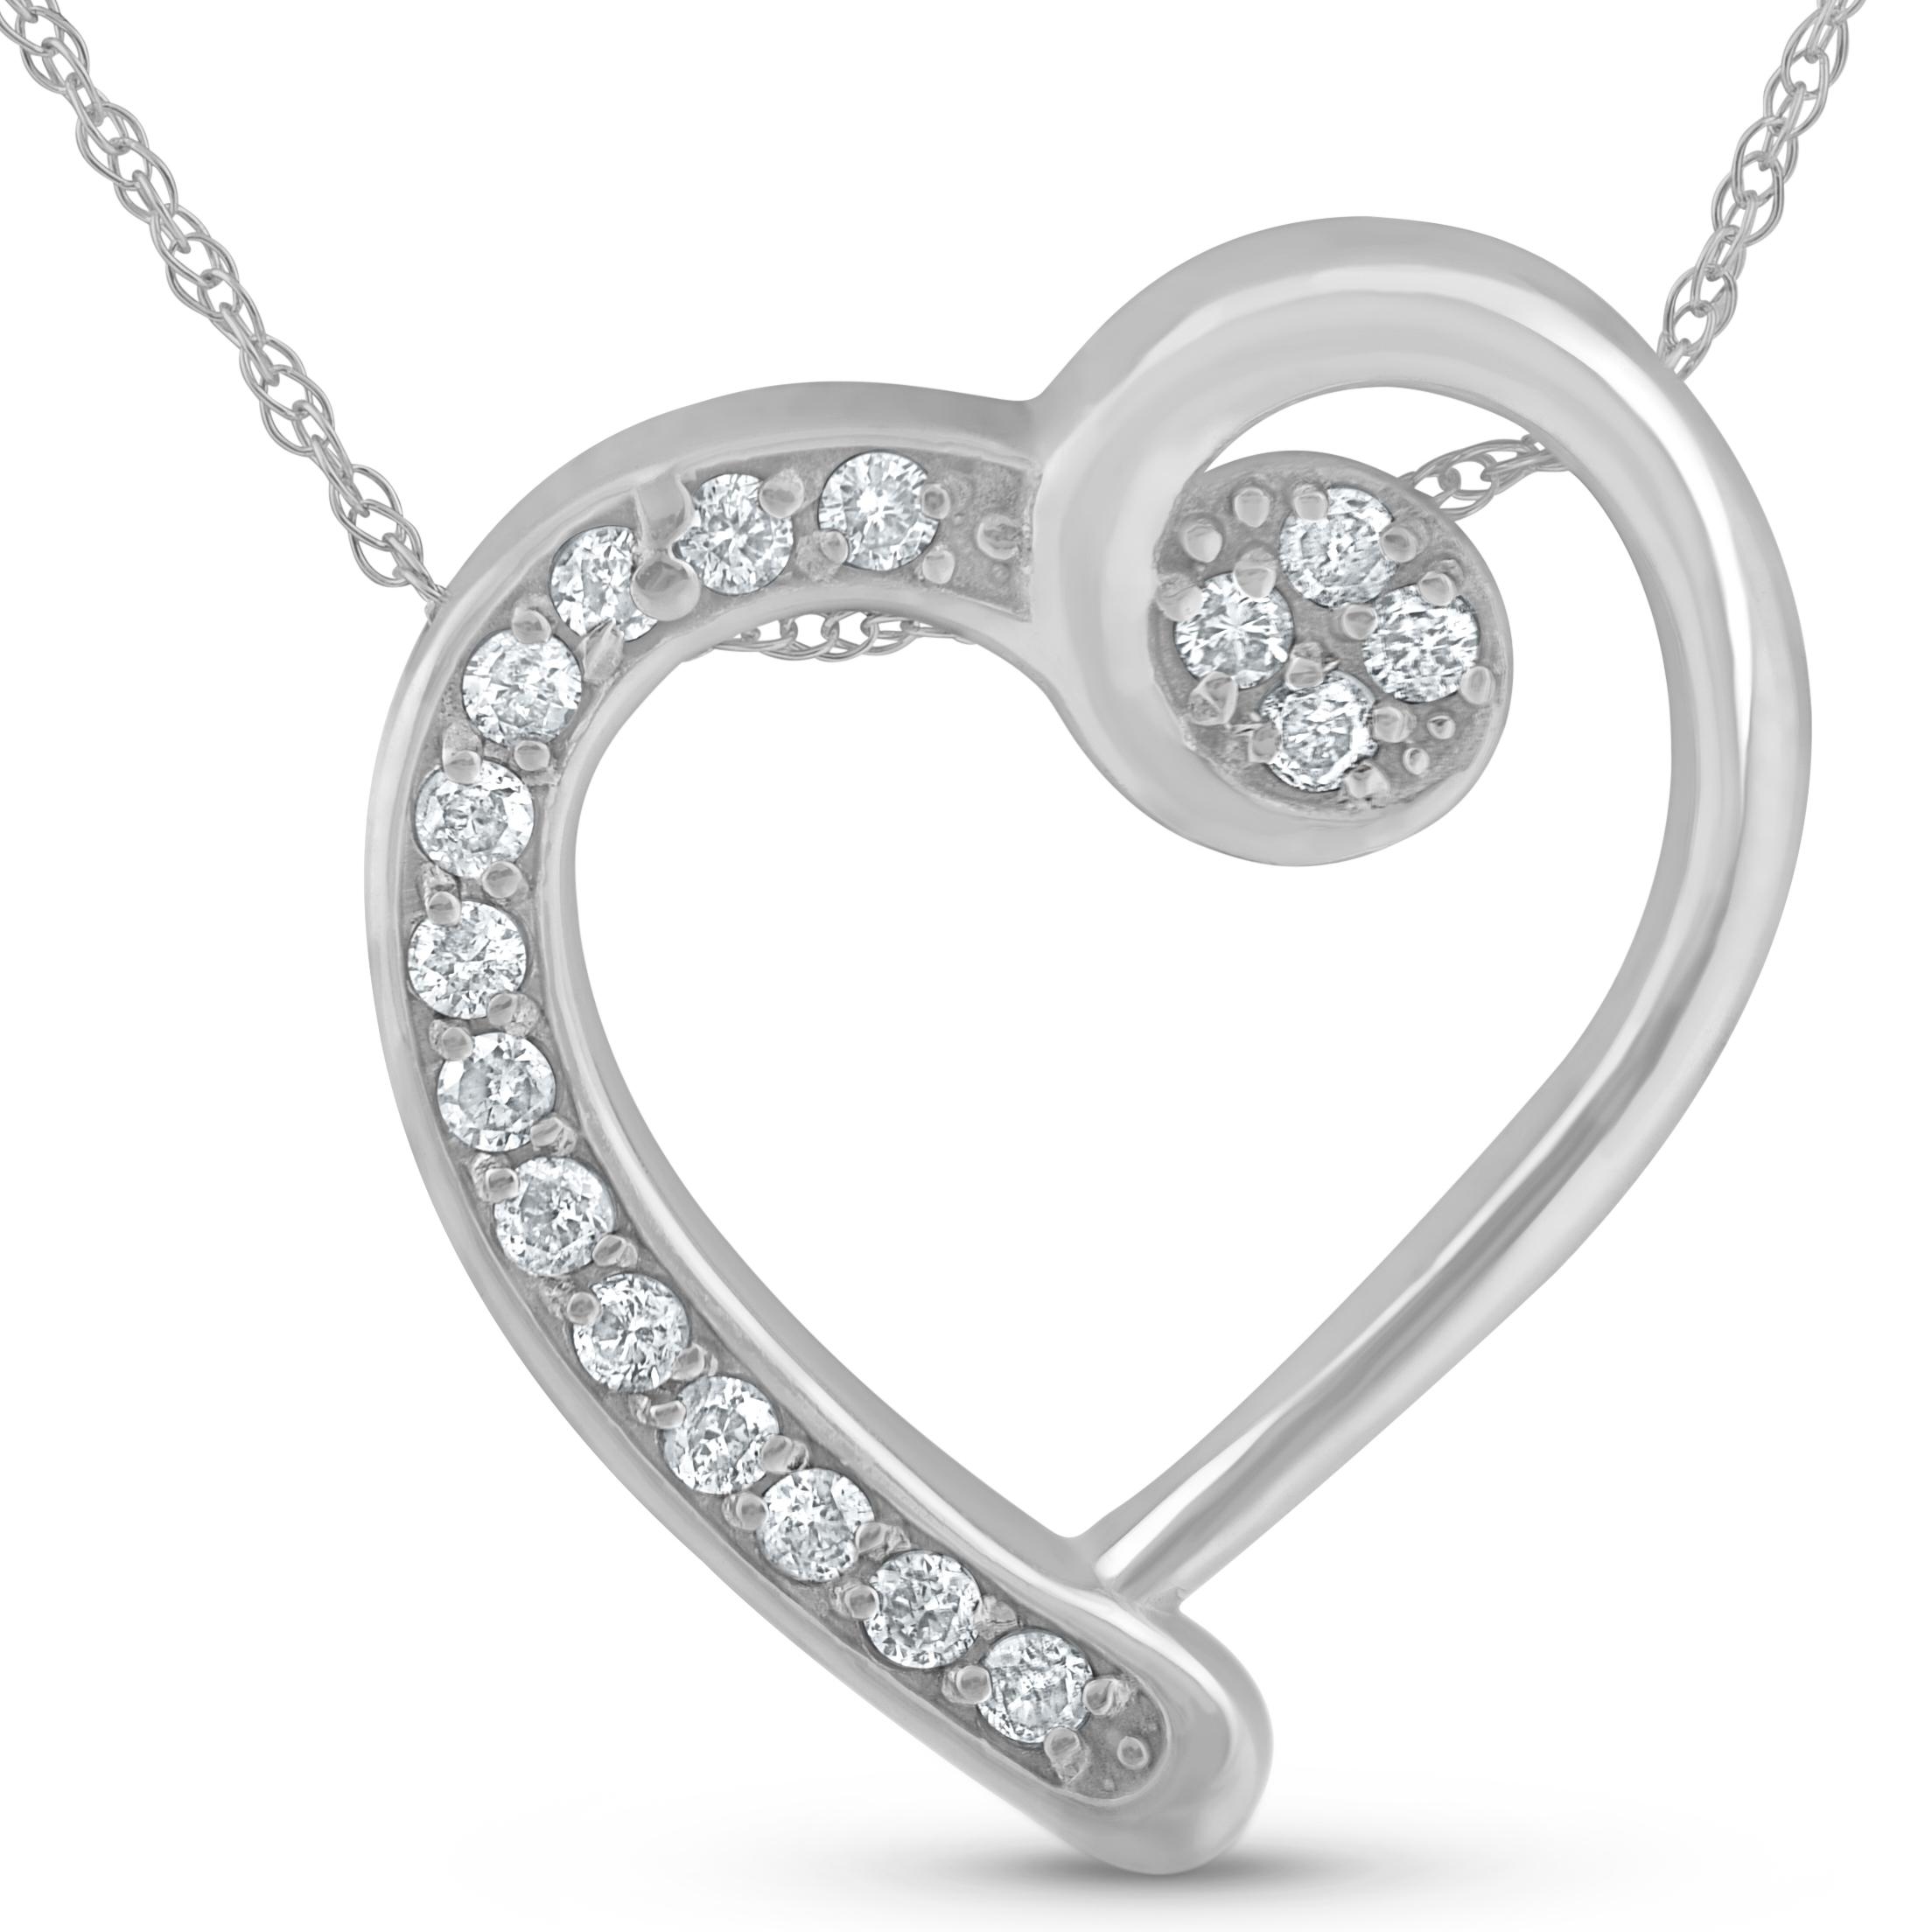 32e851f8a5e6f Details about 1/4ct Diamond Heart Pendant 14k White Gold